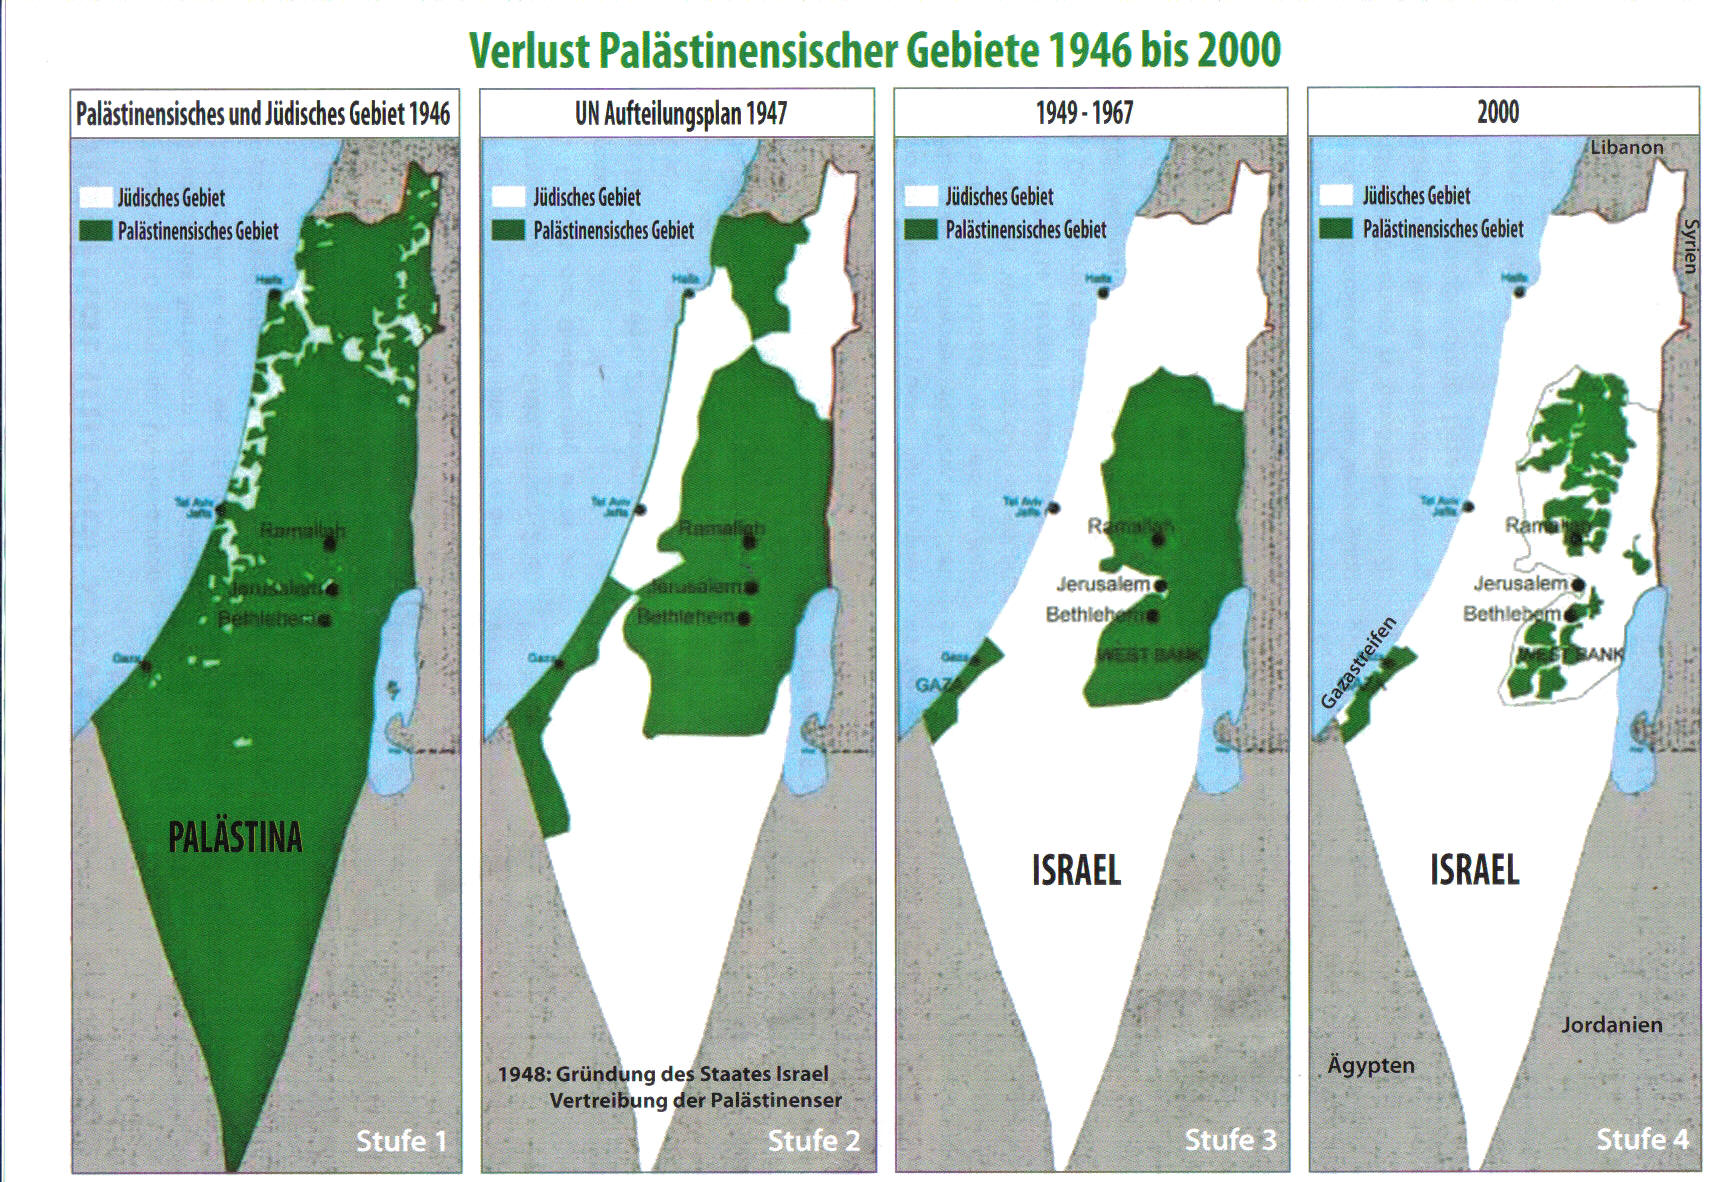 Jerusalem Karte Heute.Karten Zum Nahostkonflikt Palastina Israel